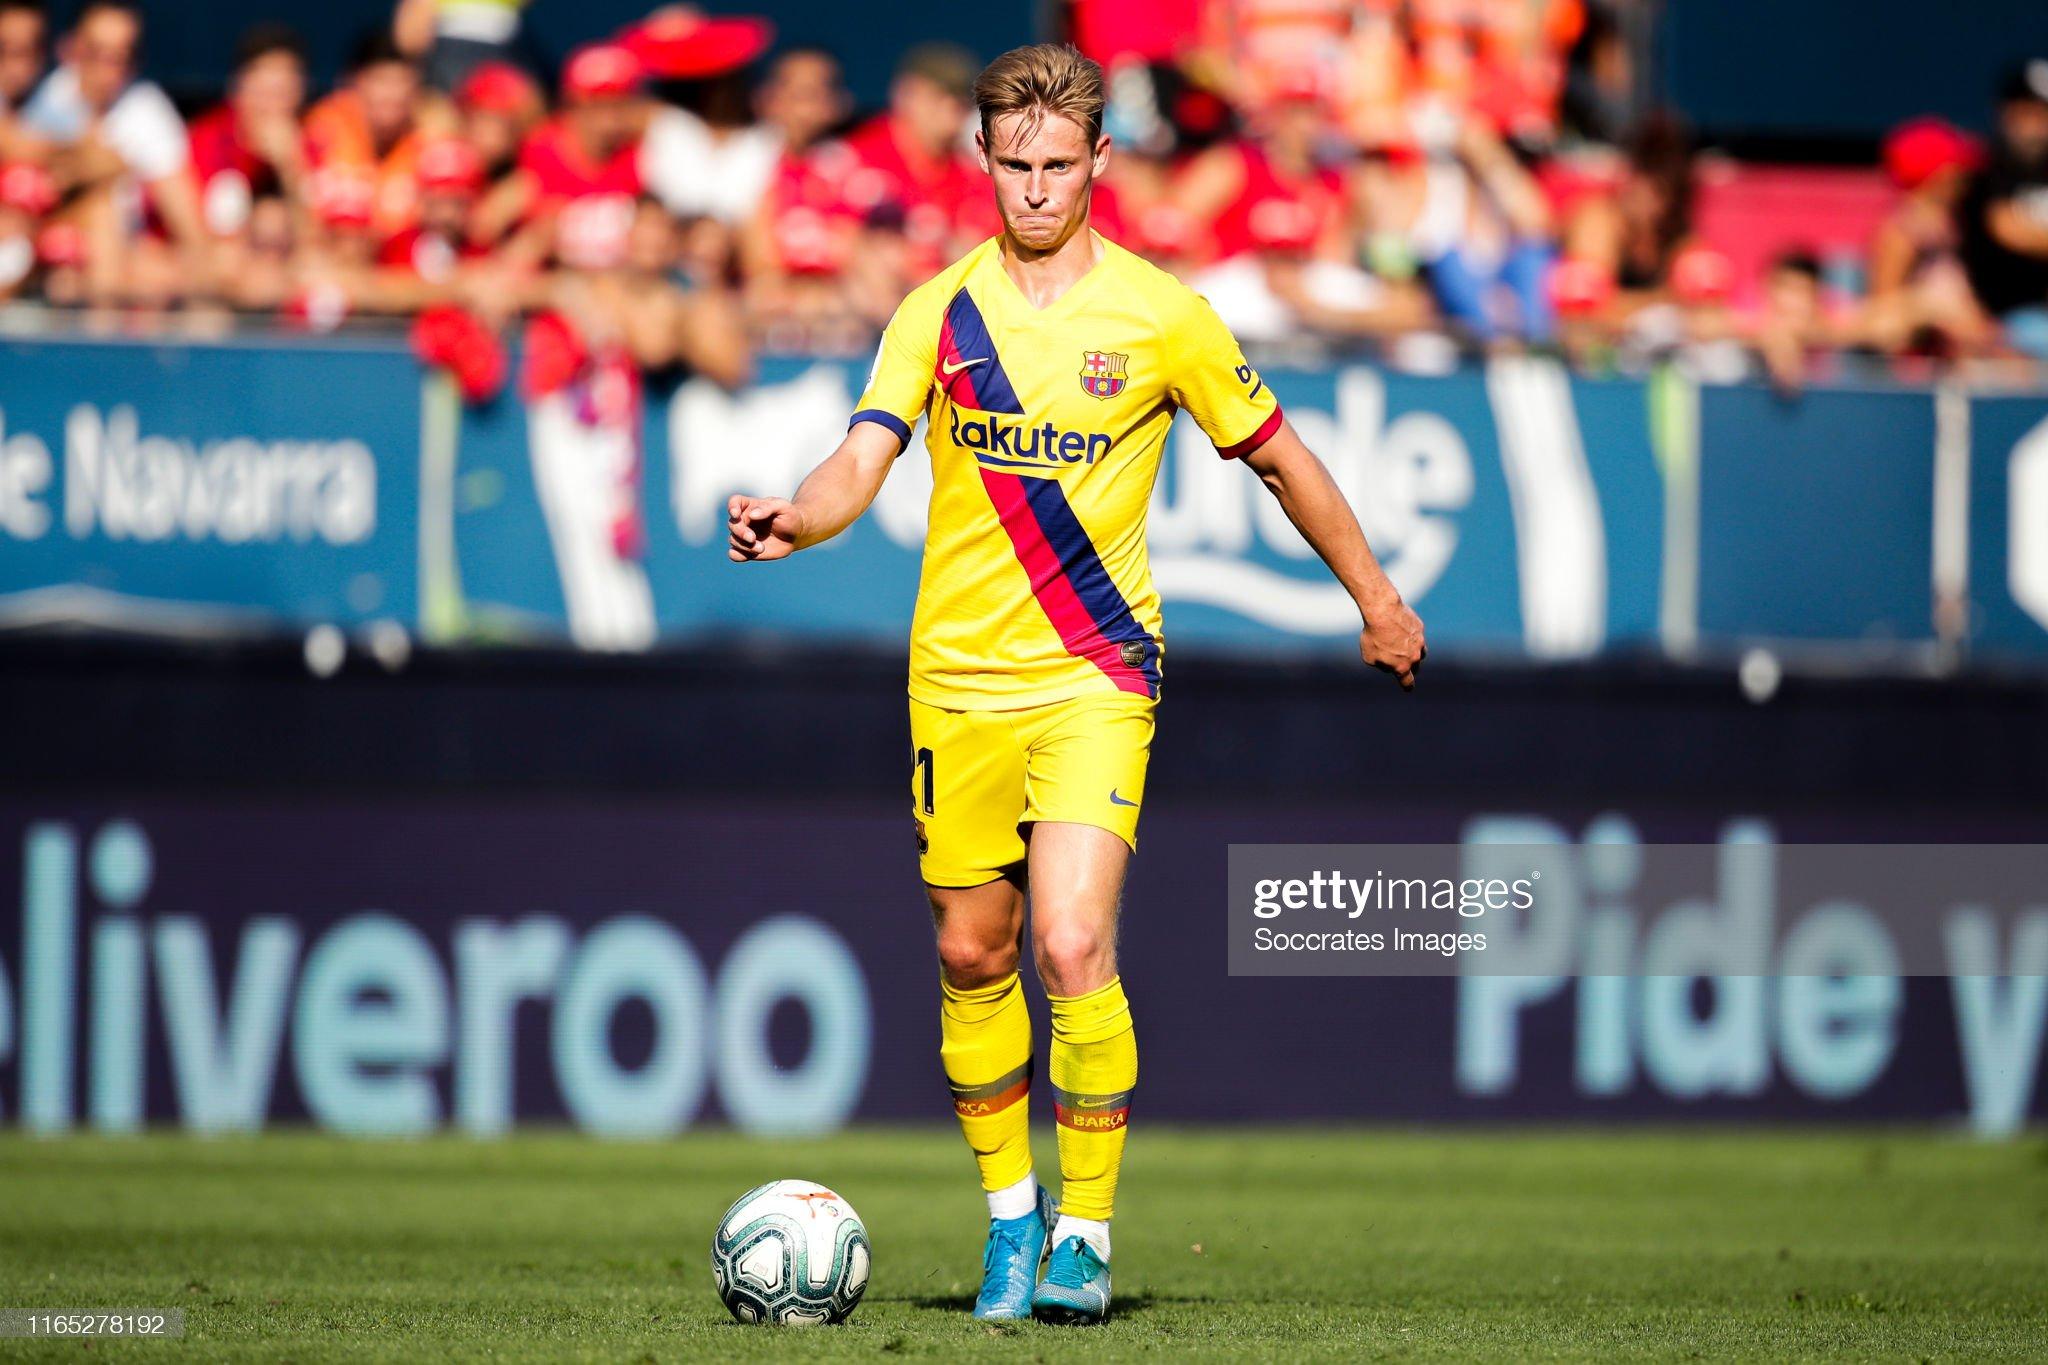 صور مباراة : أوساسونا - برشلونة 2-2 ( 31-08-2019 )  Frenkie-de-jong-of-fc-barcelona-during-the-la-liga-santander-match-picture-id1165278192?s=2048x2048